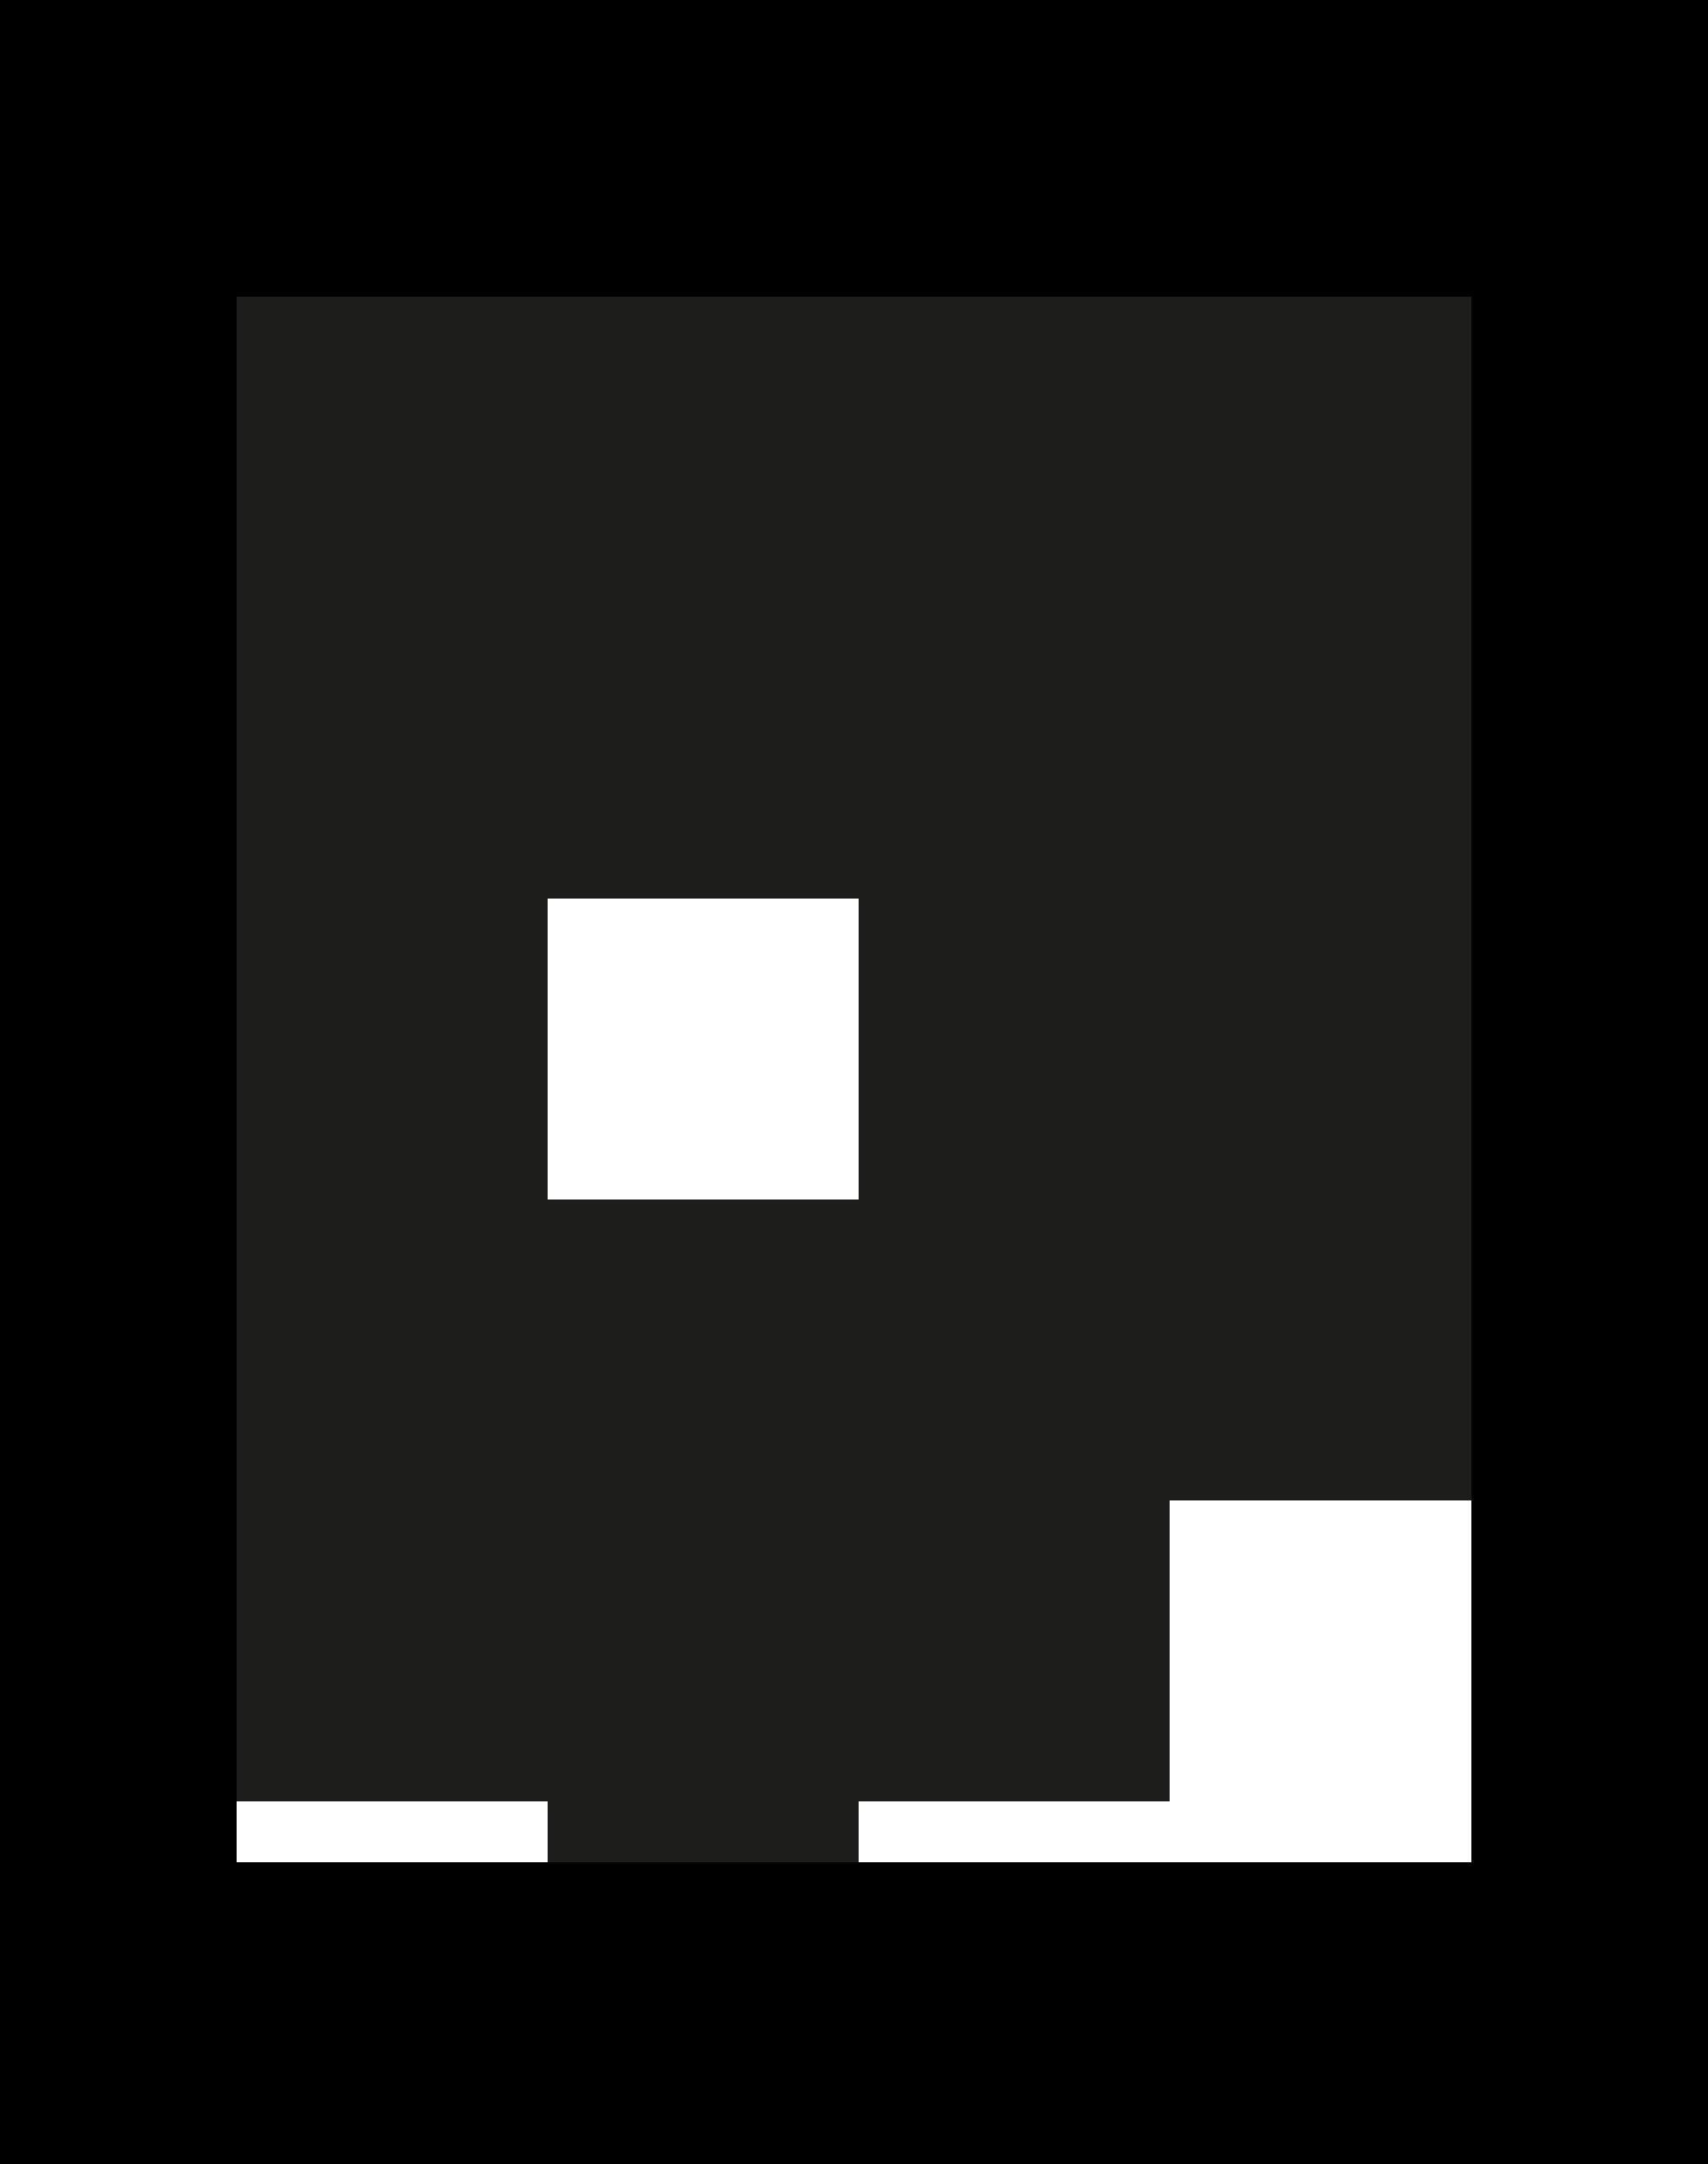 provocateur current logo.png